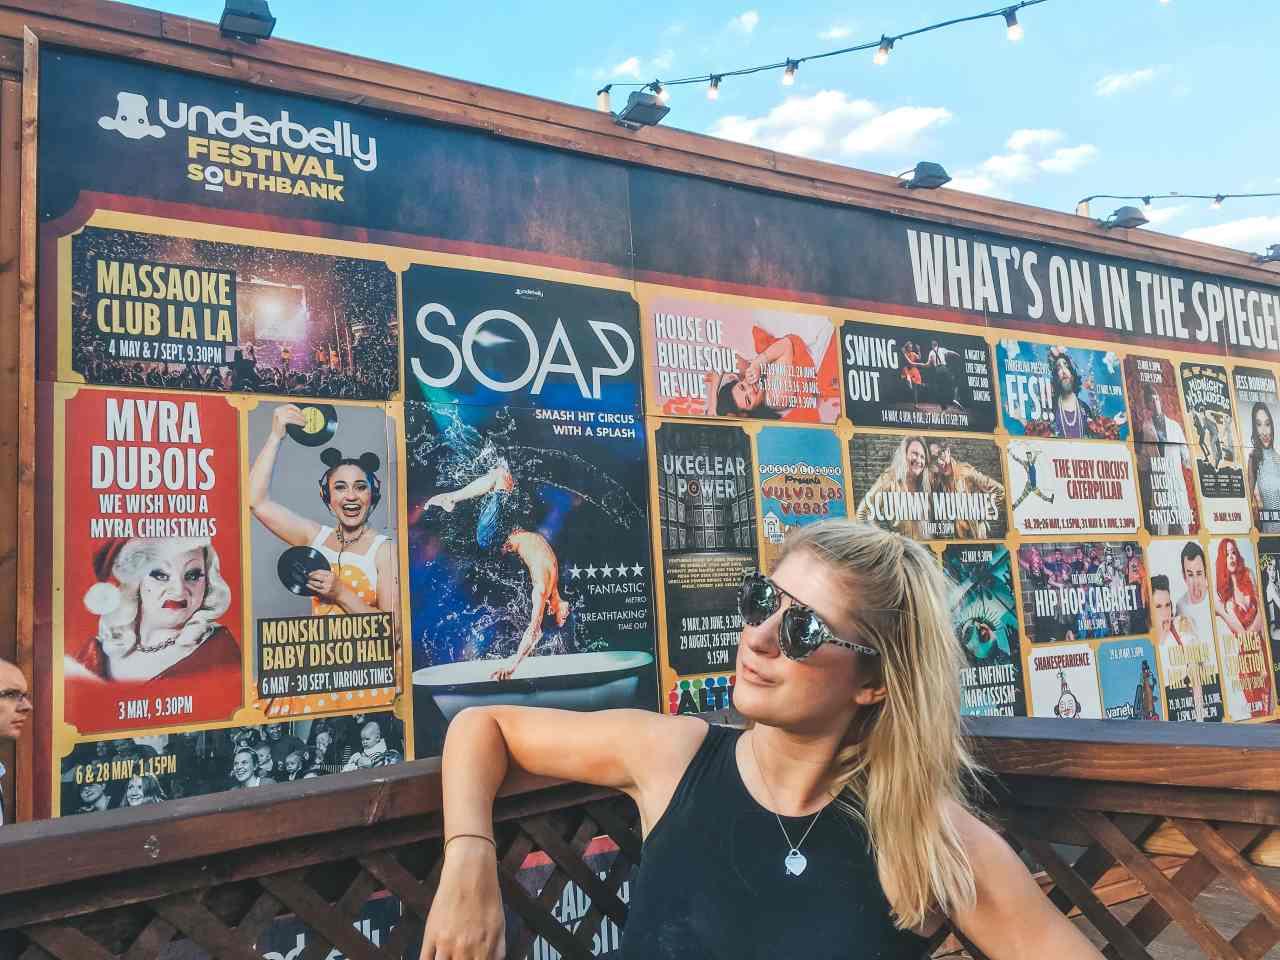 Underbelly festival southbank